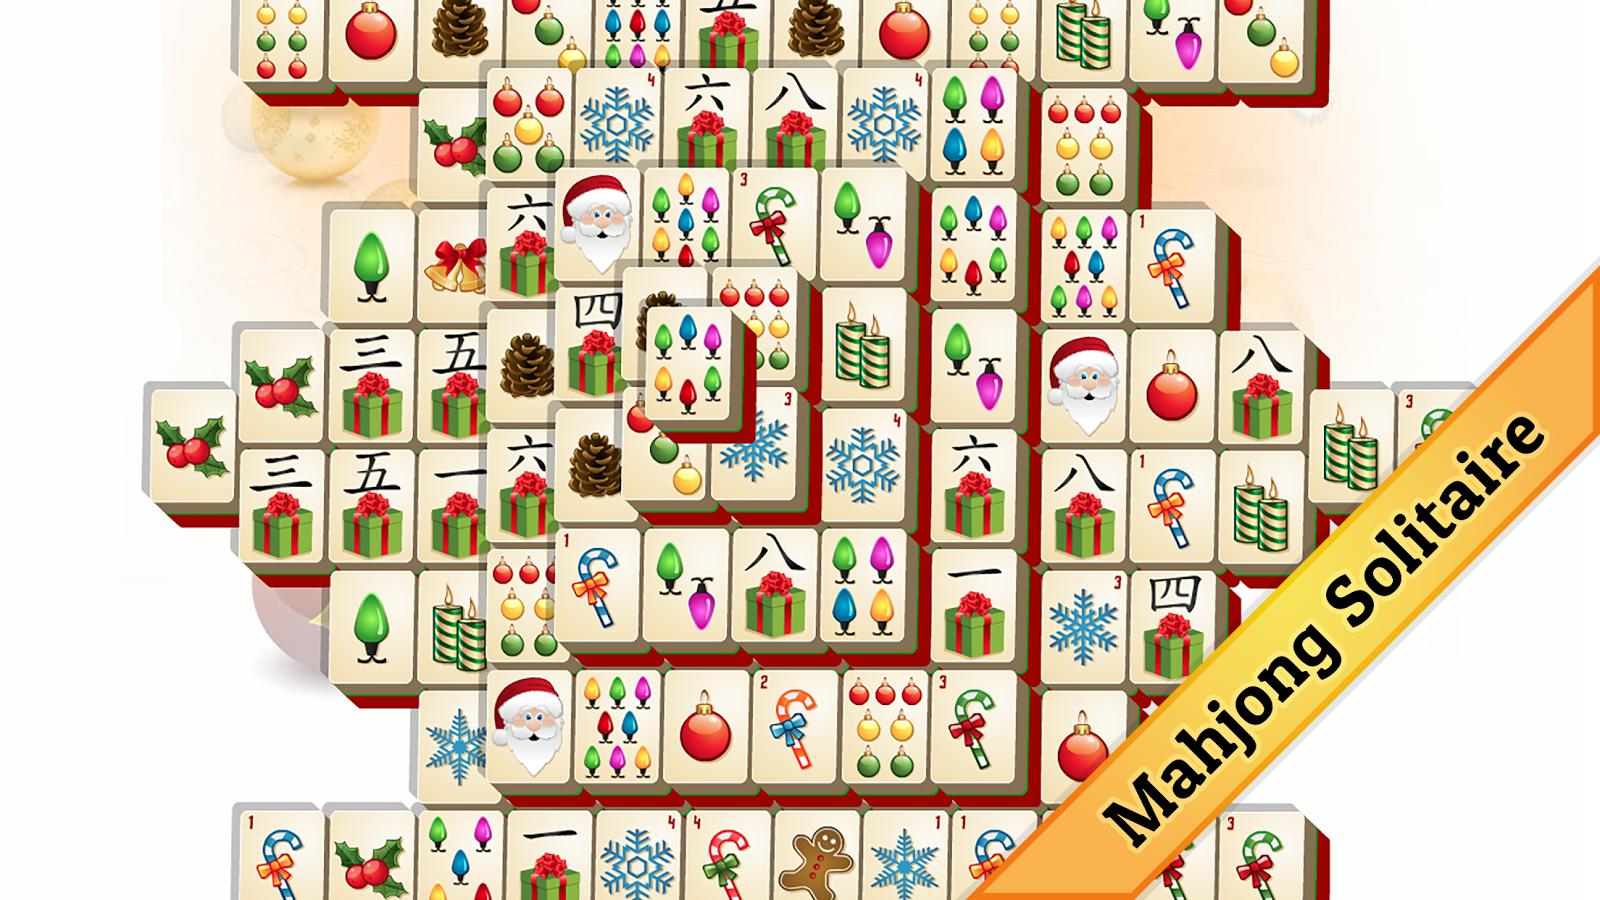 Mahjong Christmas.Christmas Mahjong 2 0 5 Apk Download Android Puzzle Games